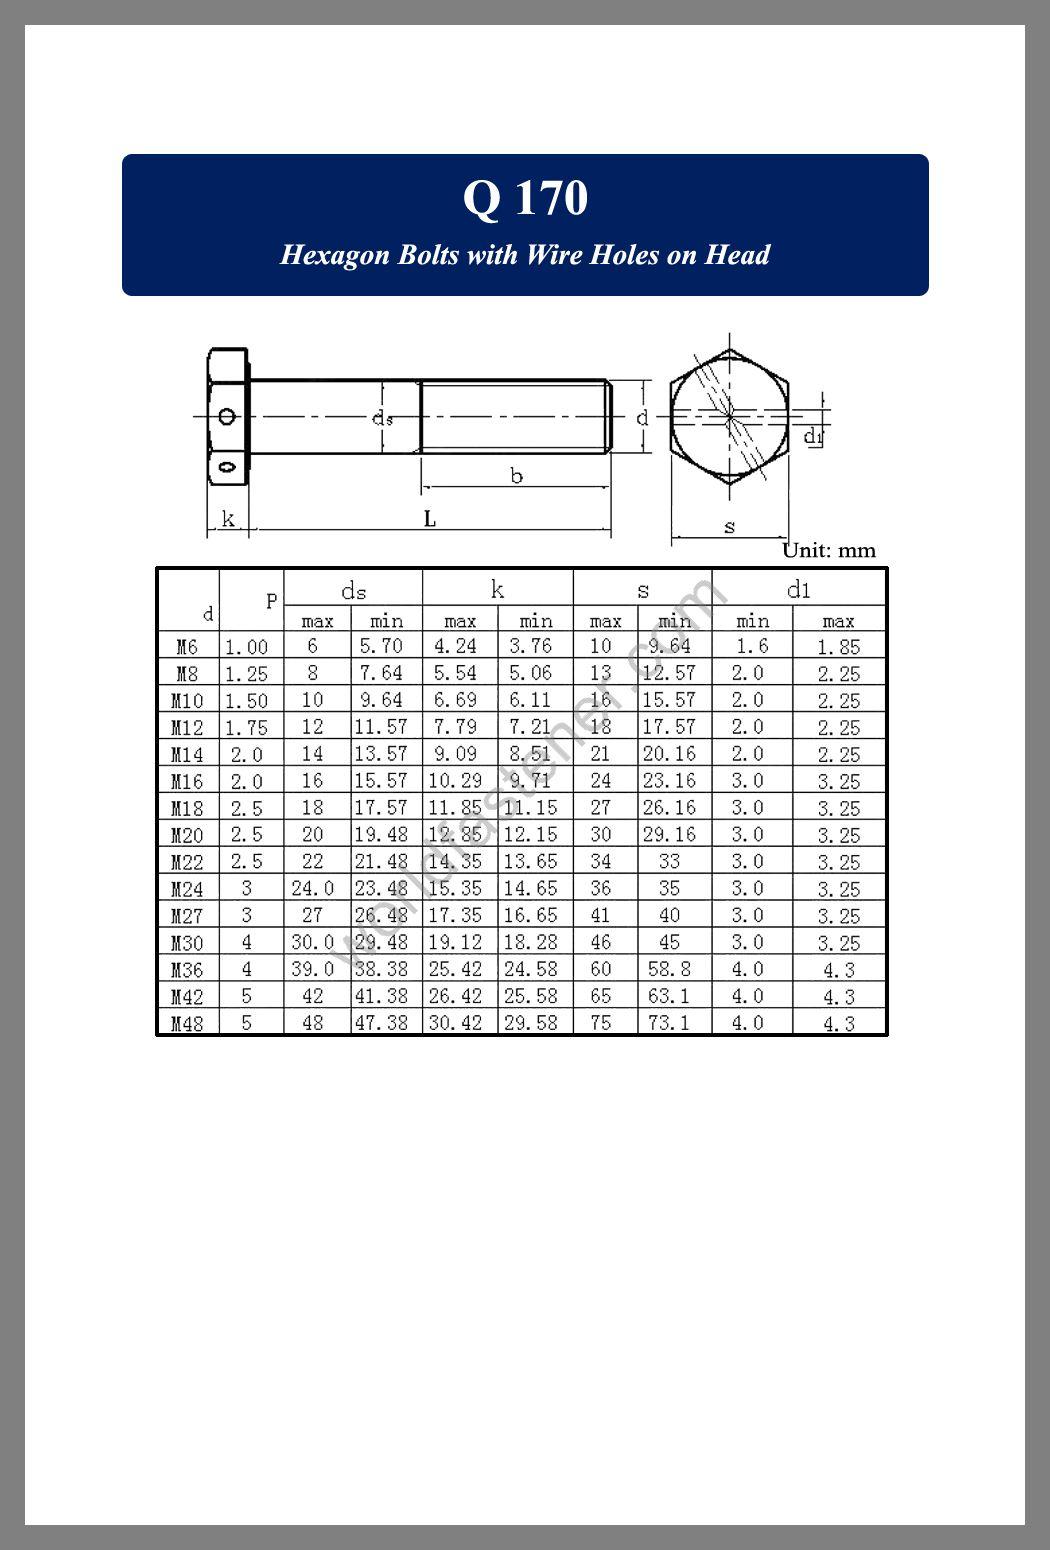 Q170, Q 170 Hexagon Bolts, fastener, screw, bolt, Q bolt, Q Standard Fastener